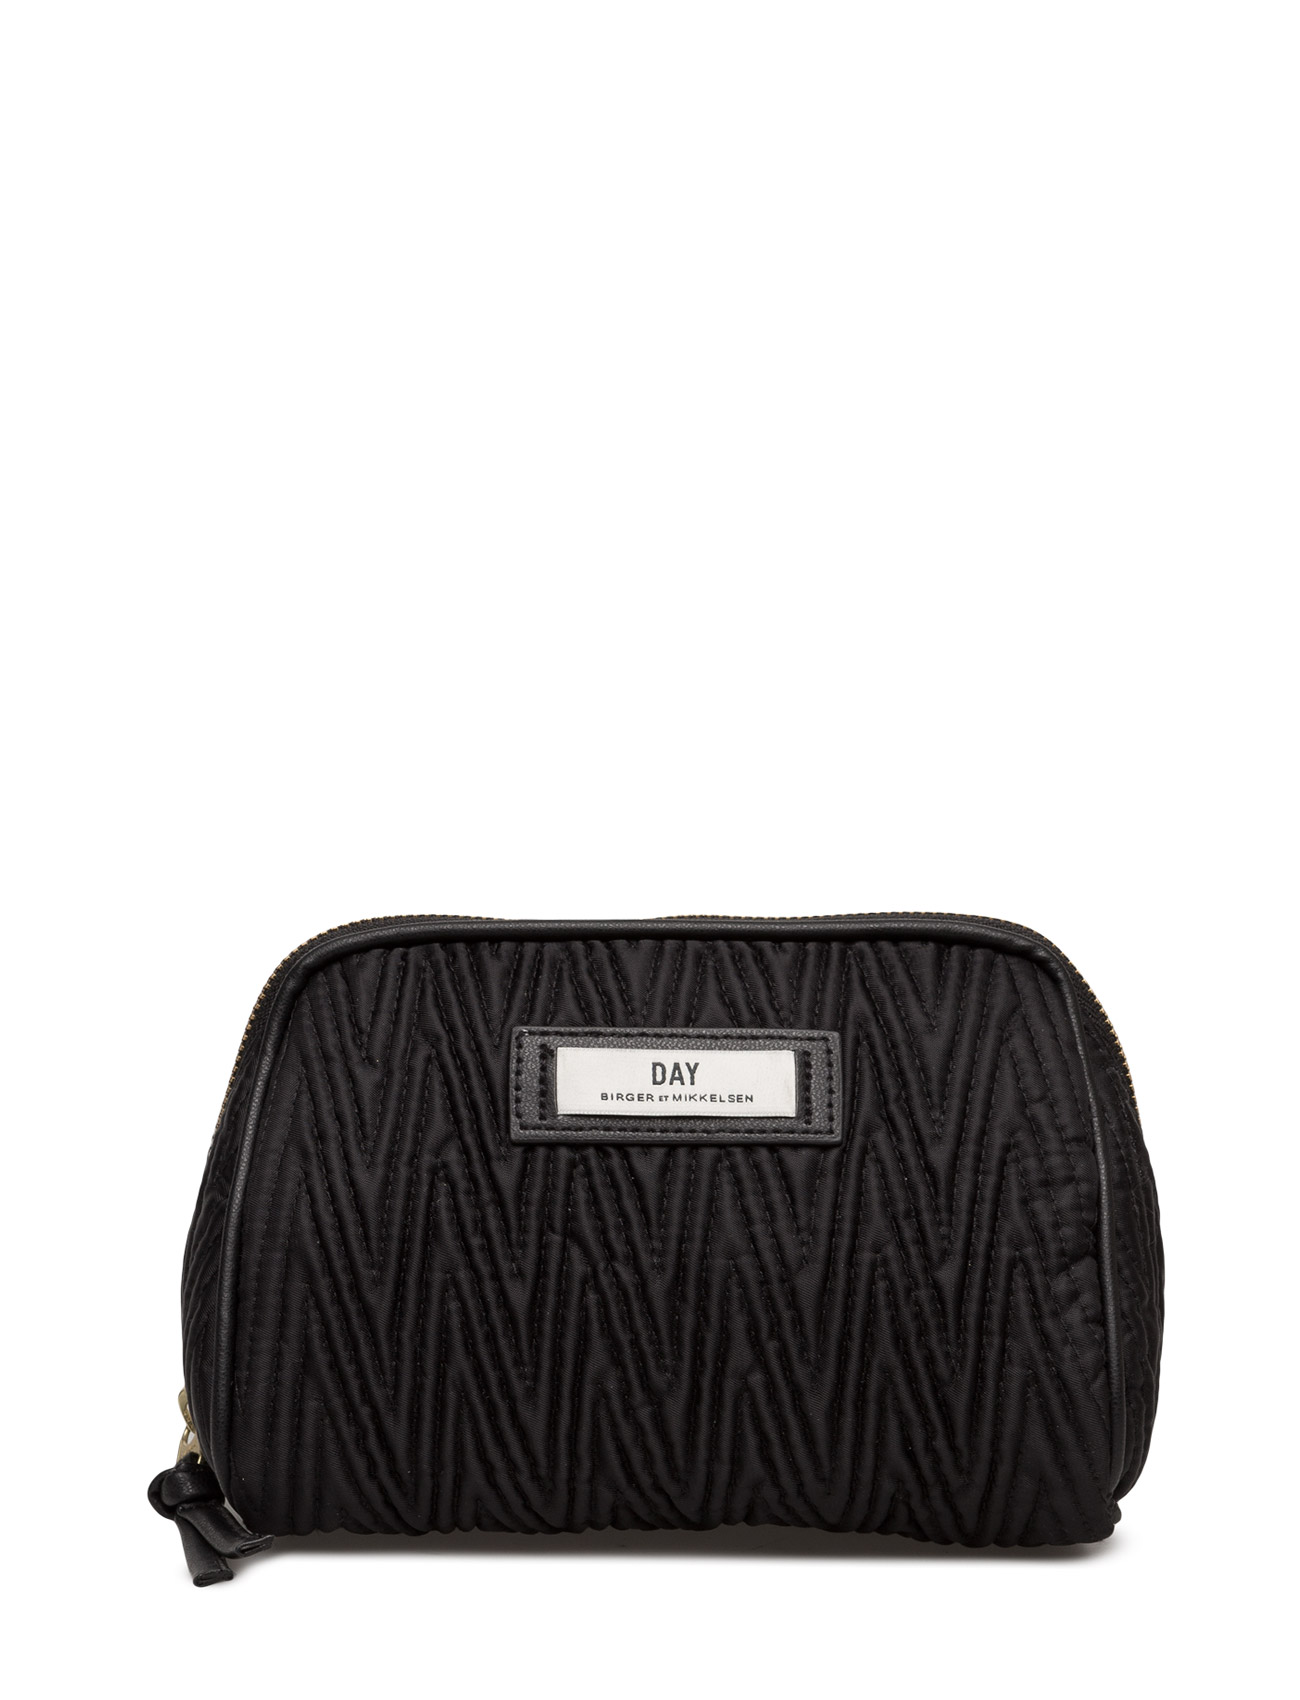 Day – Day drape purse - black, 4 stk. på lager fra pixizoo